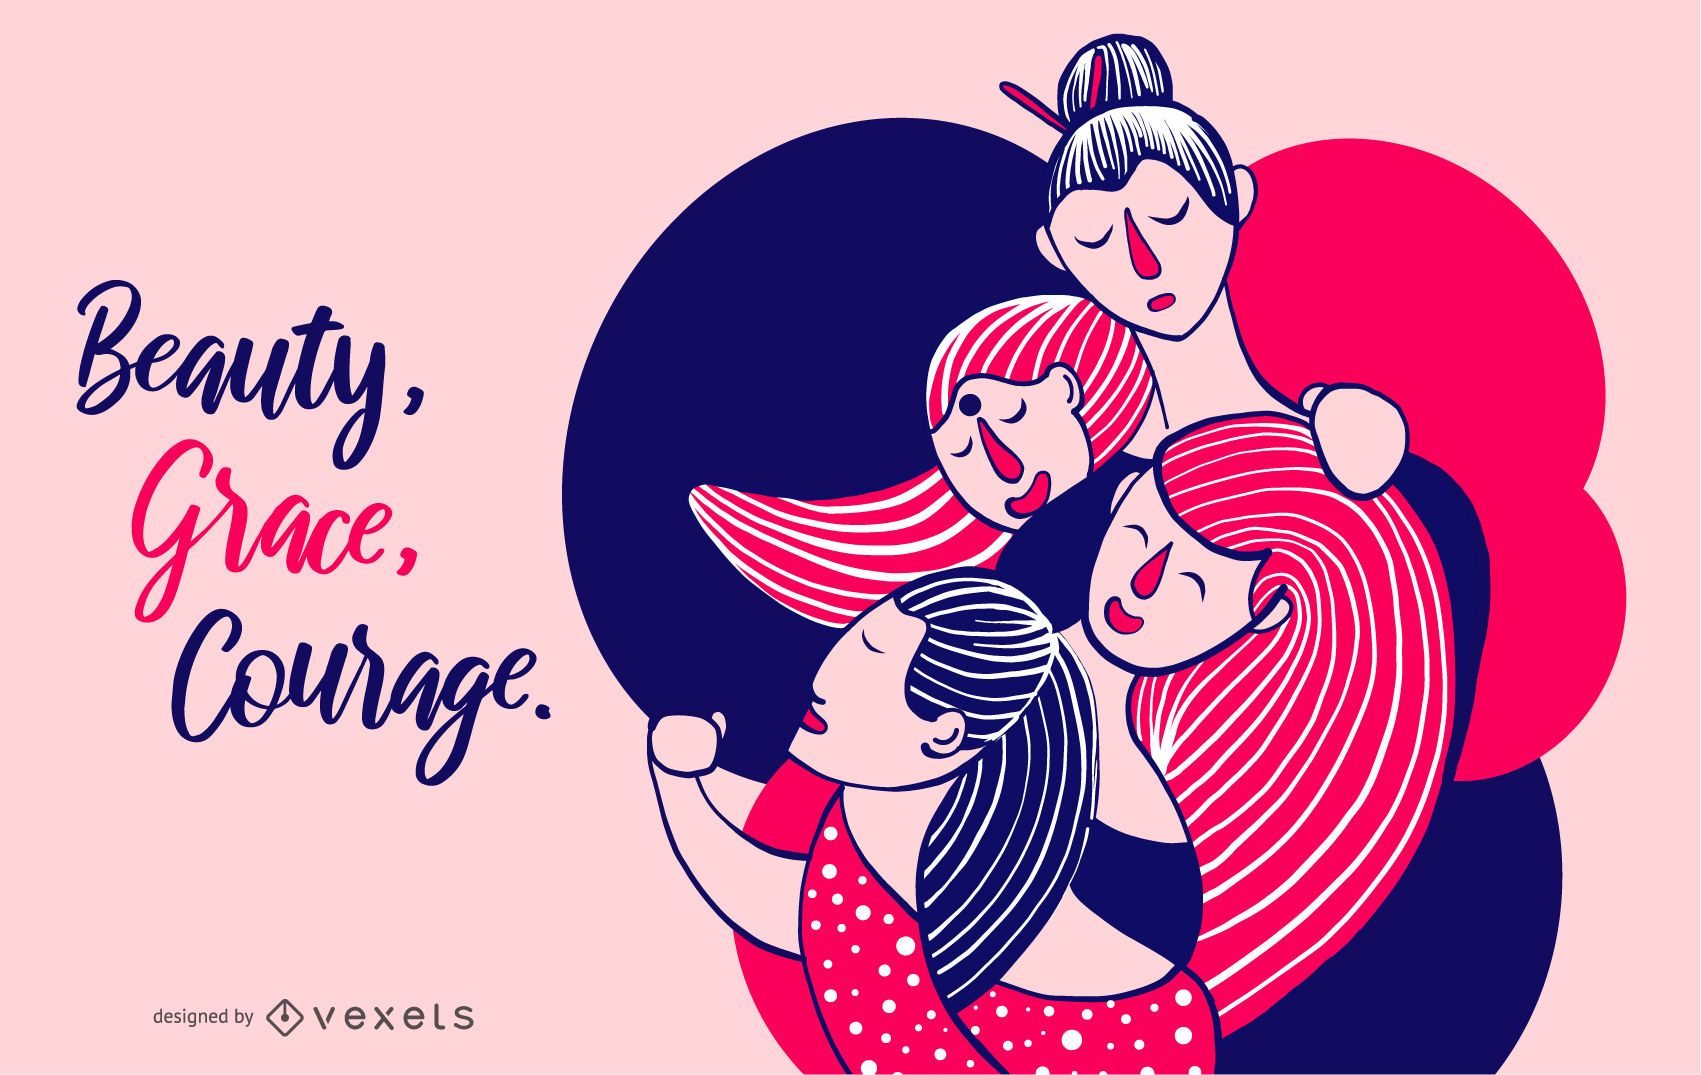 Women's Beauty Grace Courage Illustration